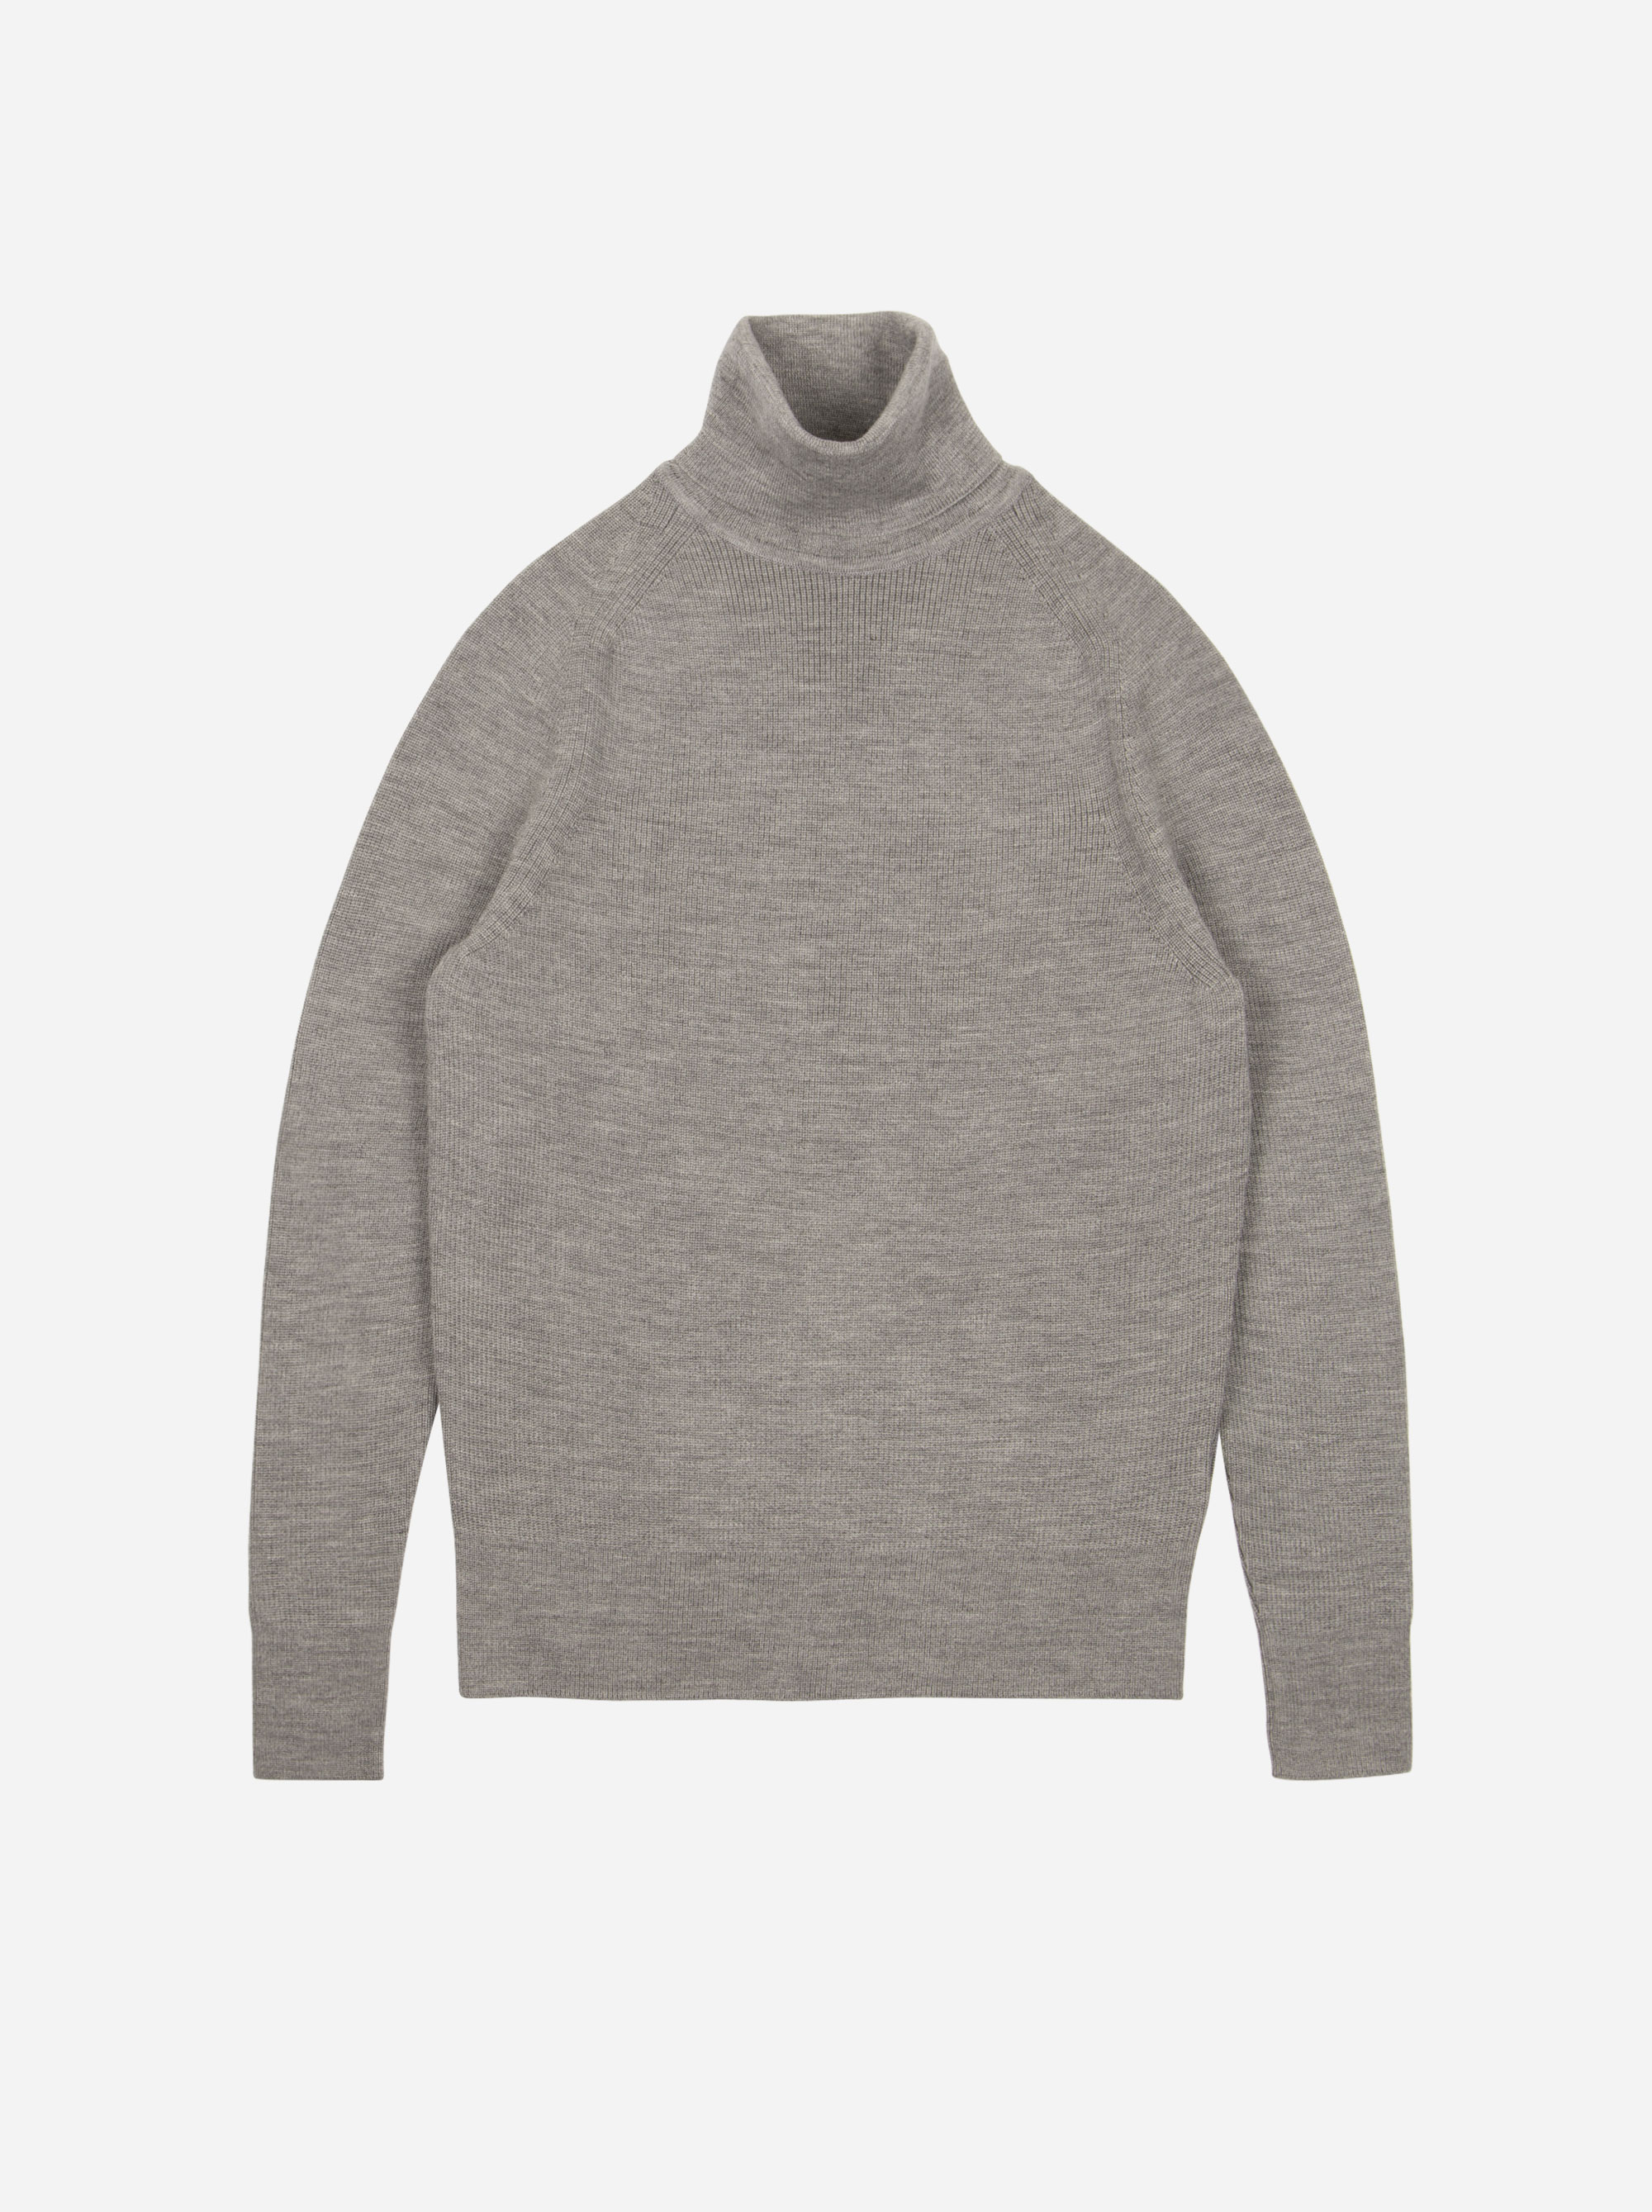 Teym - Turtleneck - The Merino Sweater - Women - Grey - 5